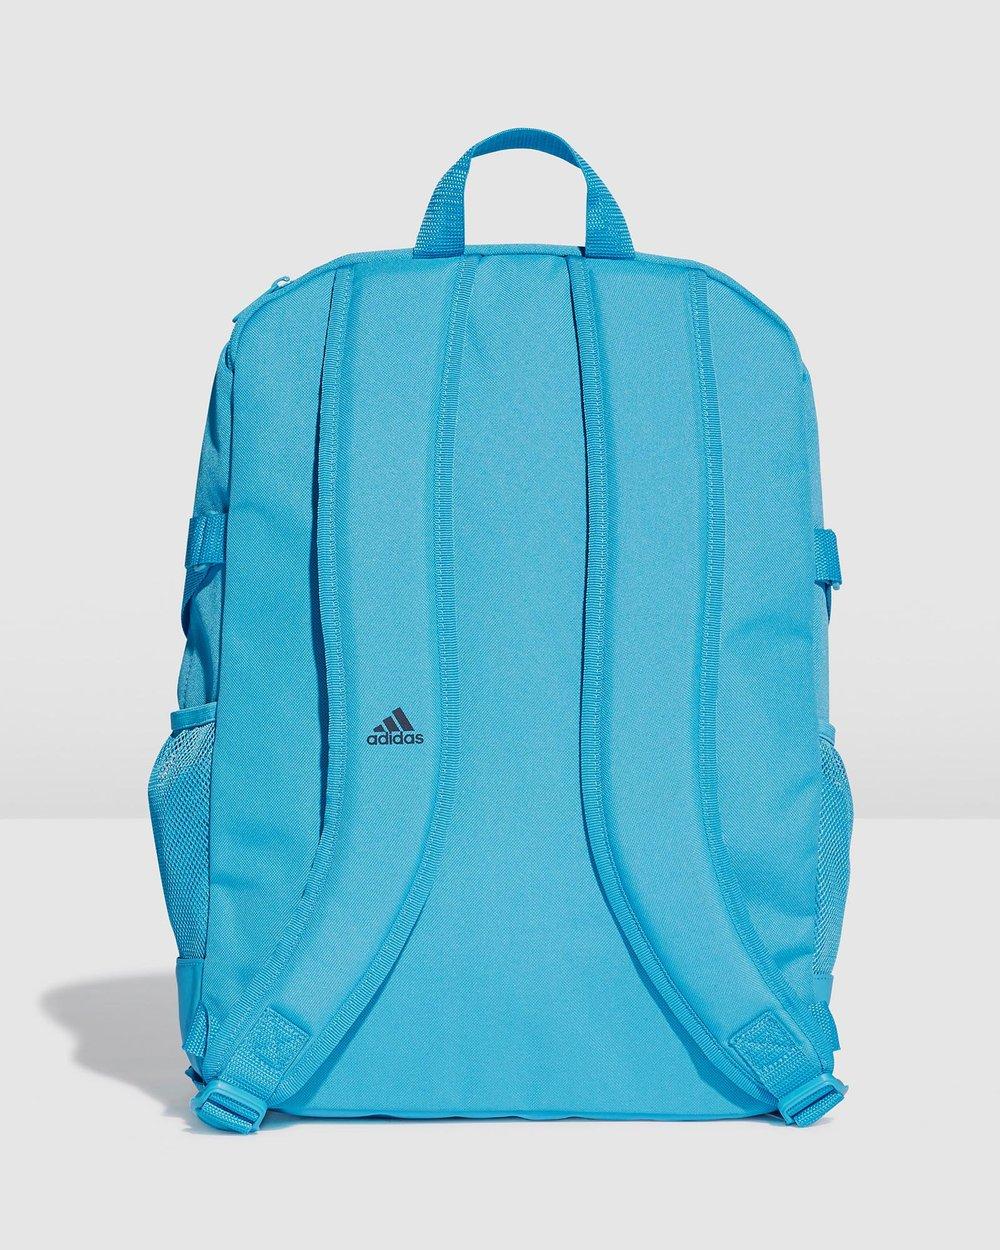 0f4ec7044ac0e 3-Stripes Power Backpack Medium by adidas Performance Online